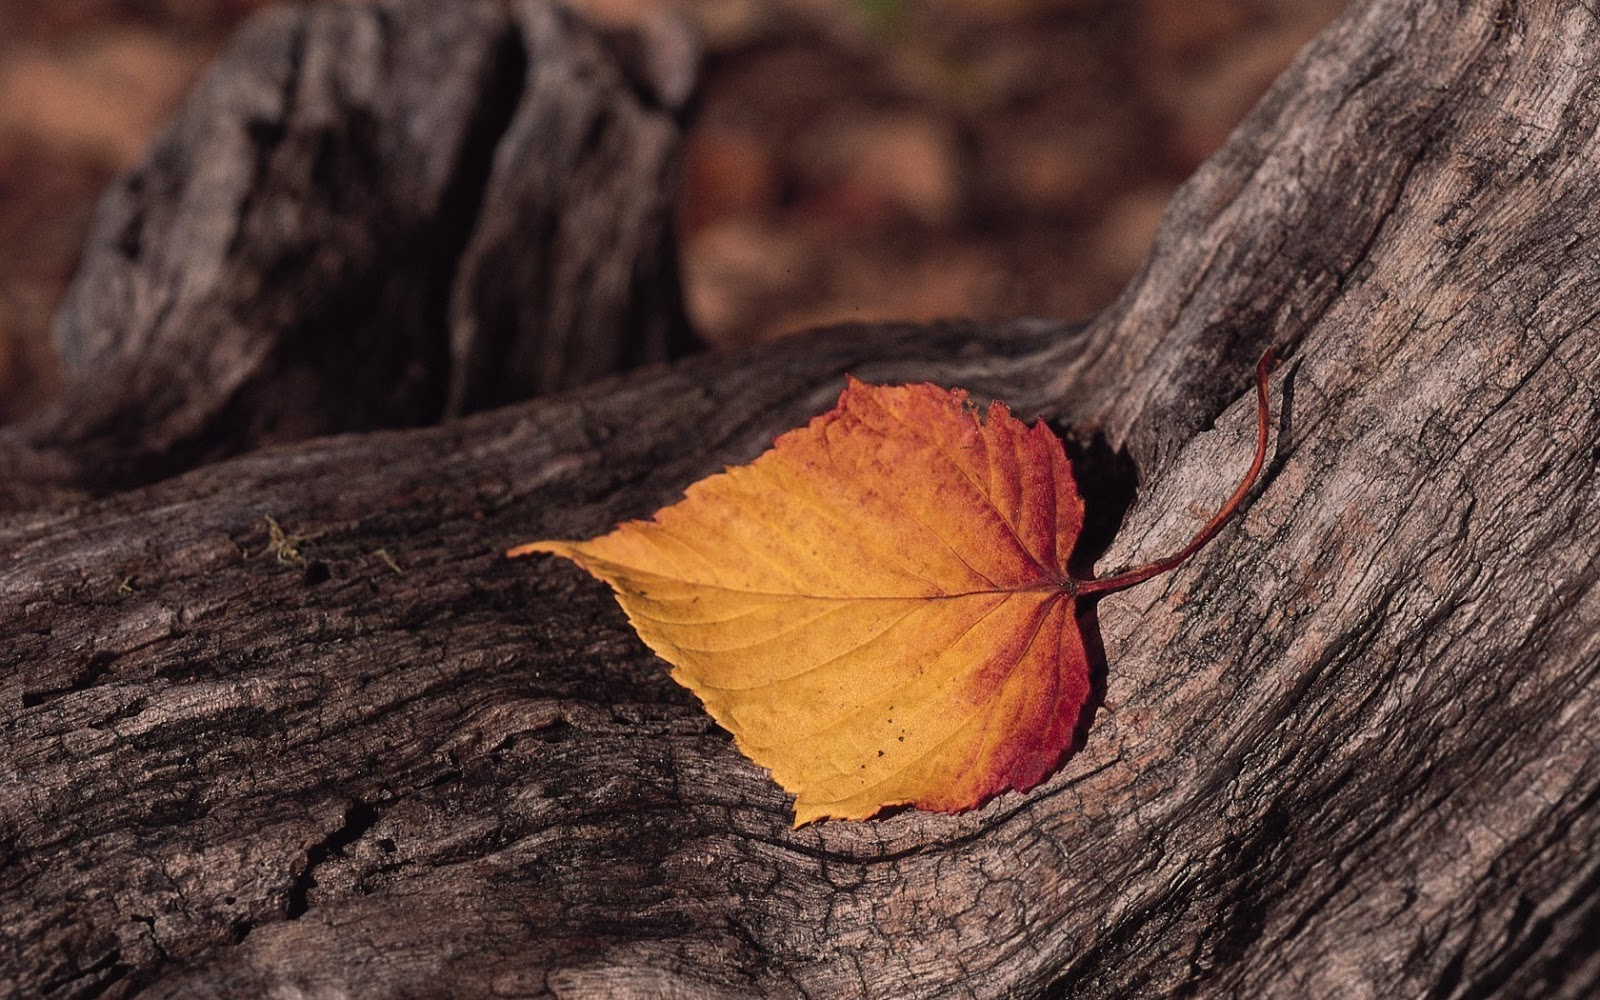 Fall Foliage Wallpaper Hd صور خلفيات أوراق الشجر جميلة عالية الدقة مداد الجليد